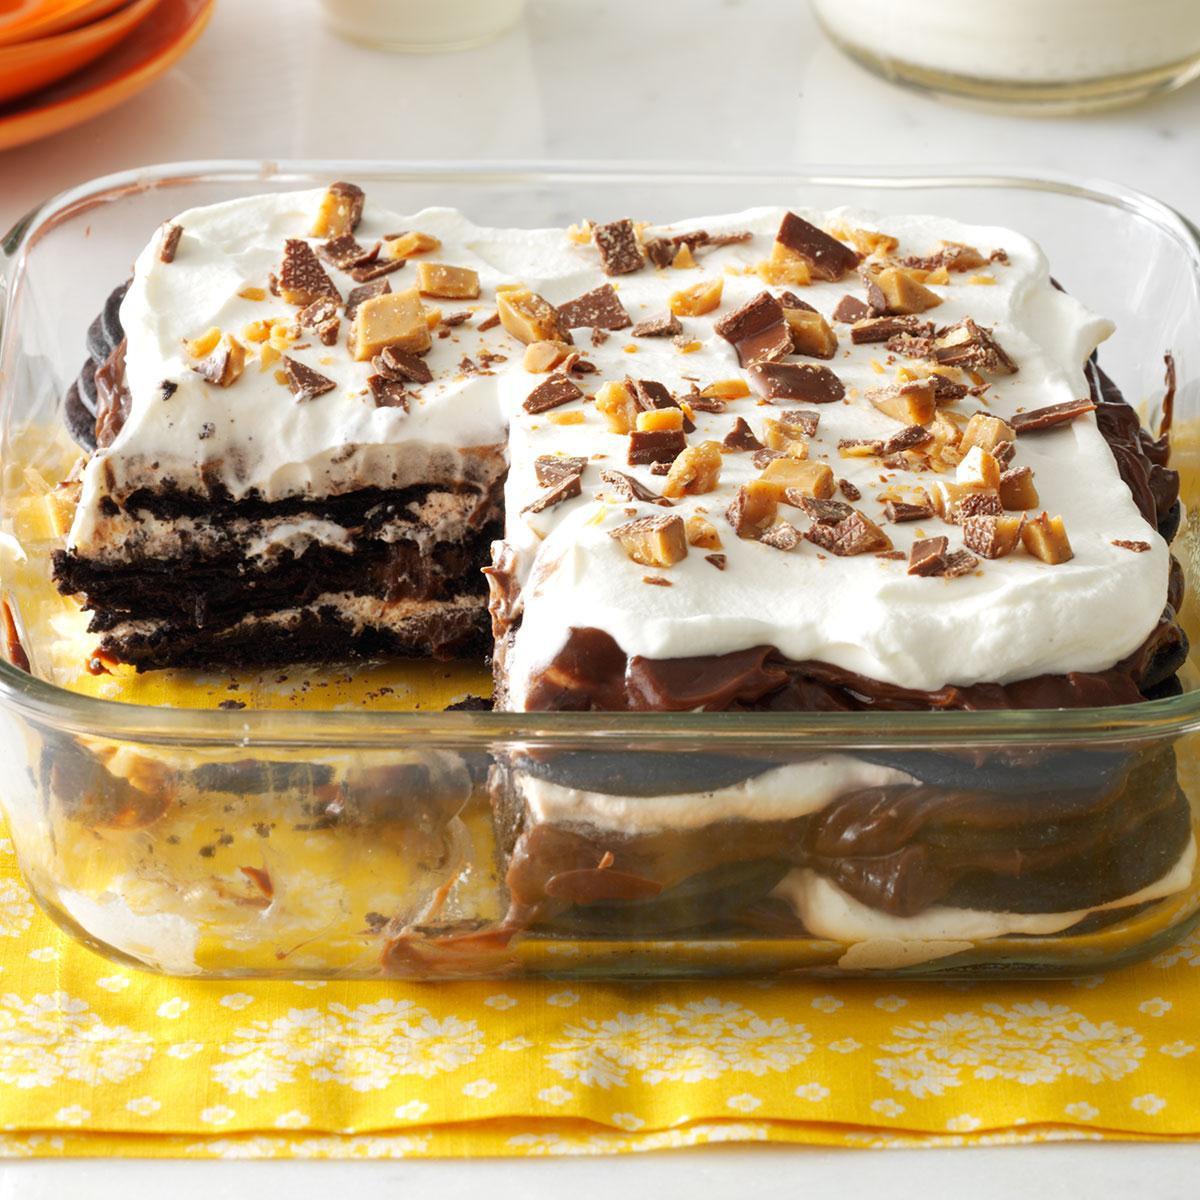 Simple Chocolate Dessert  Double Chocolate Toffee Icebox Cake Recipe